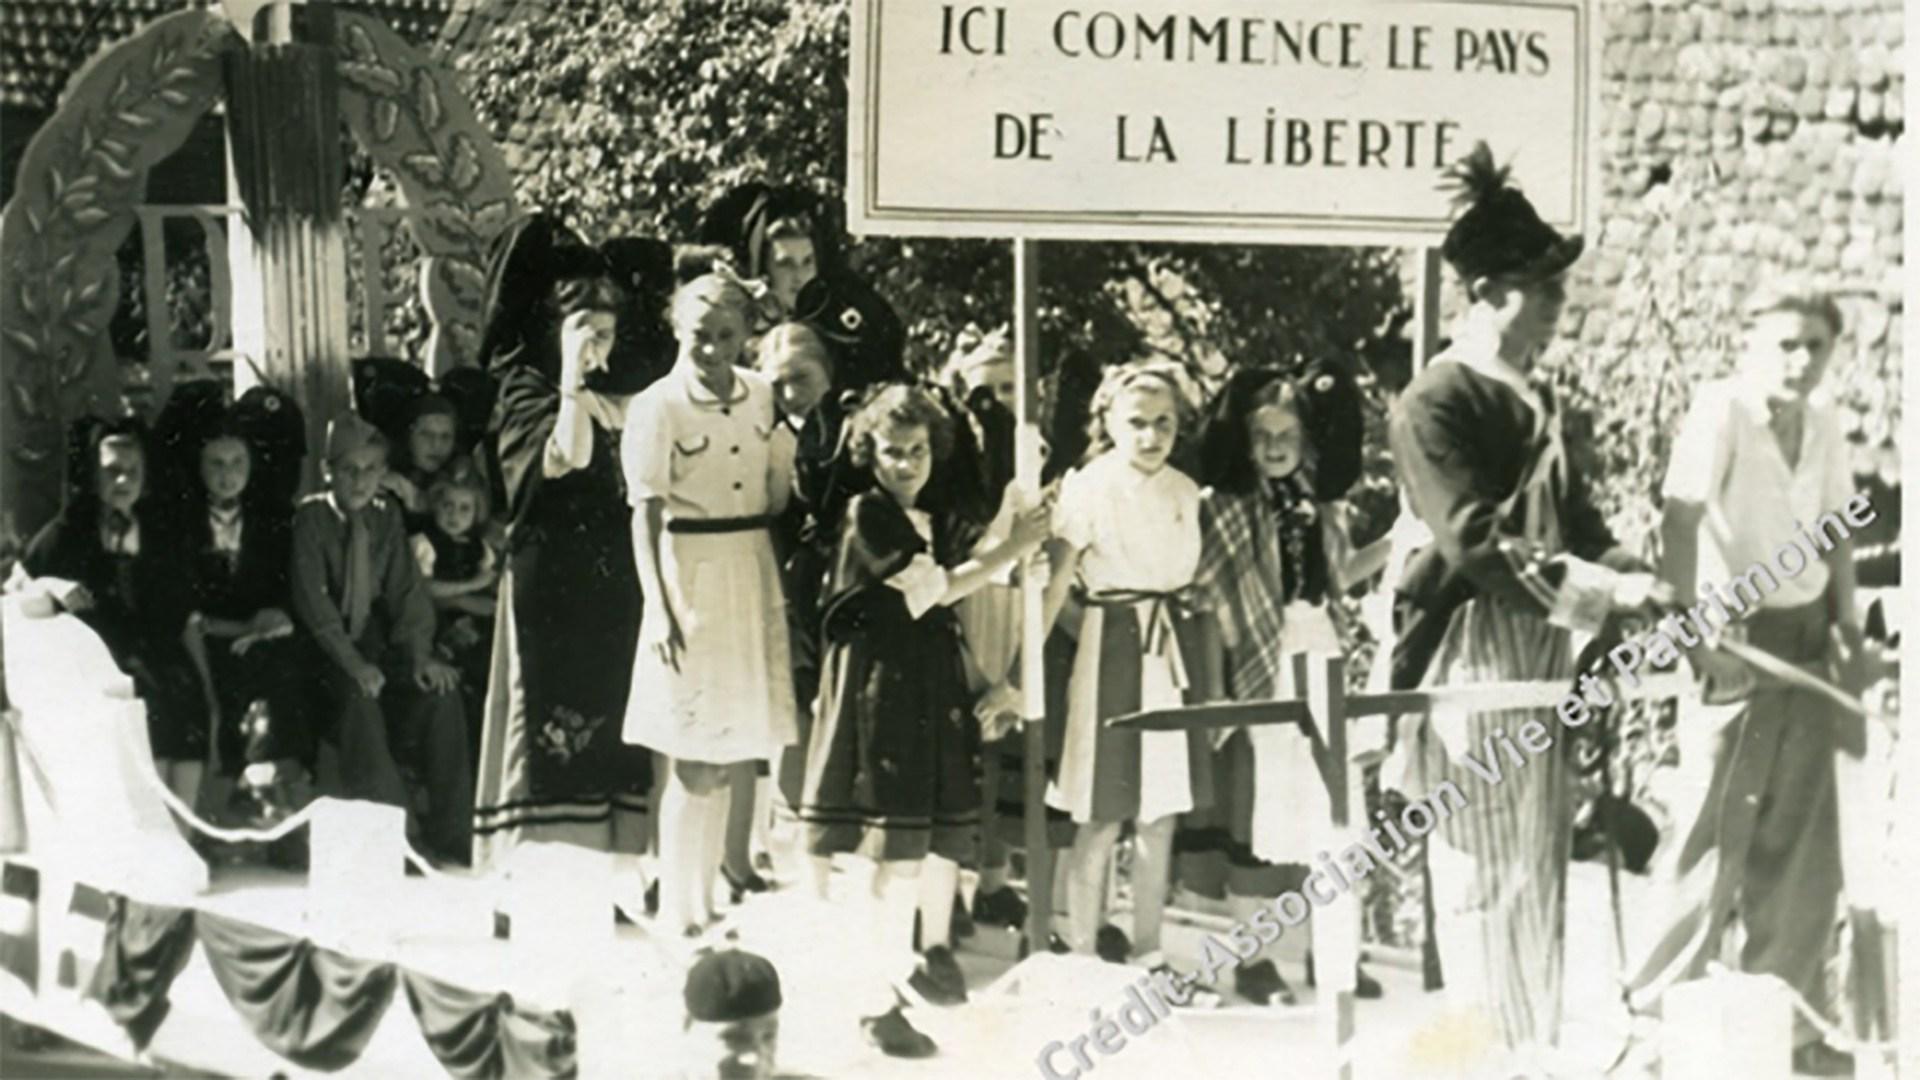 Fête de la Libération de Brunstatt, 1945